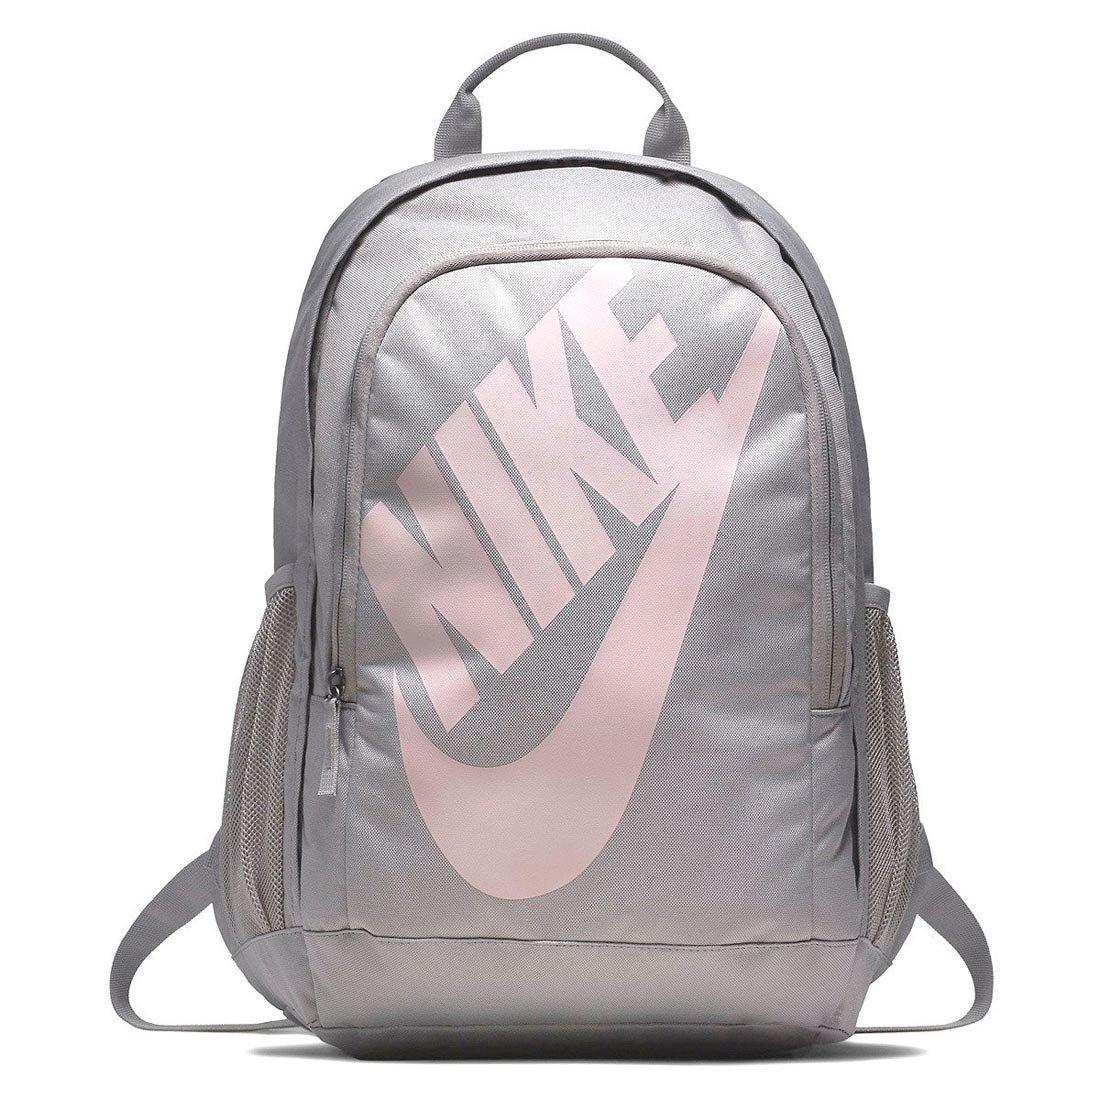 43eb20c343351 Plecak Nike Hayward Futura 2.0 BA5217-027 Kliknij